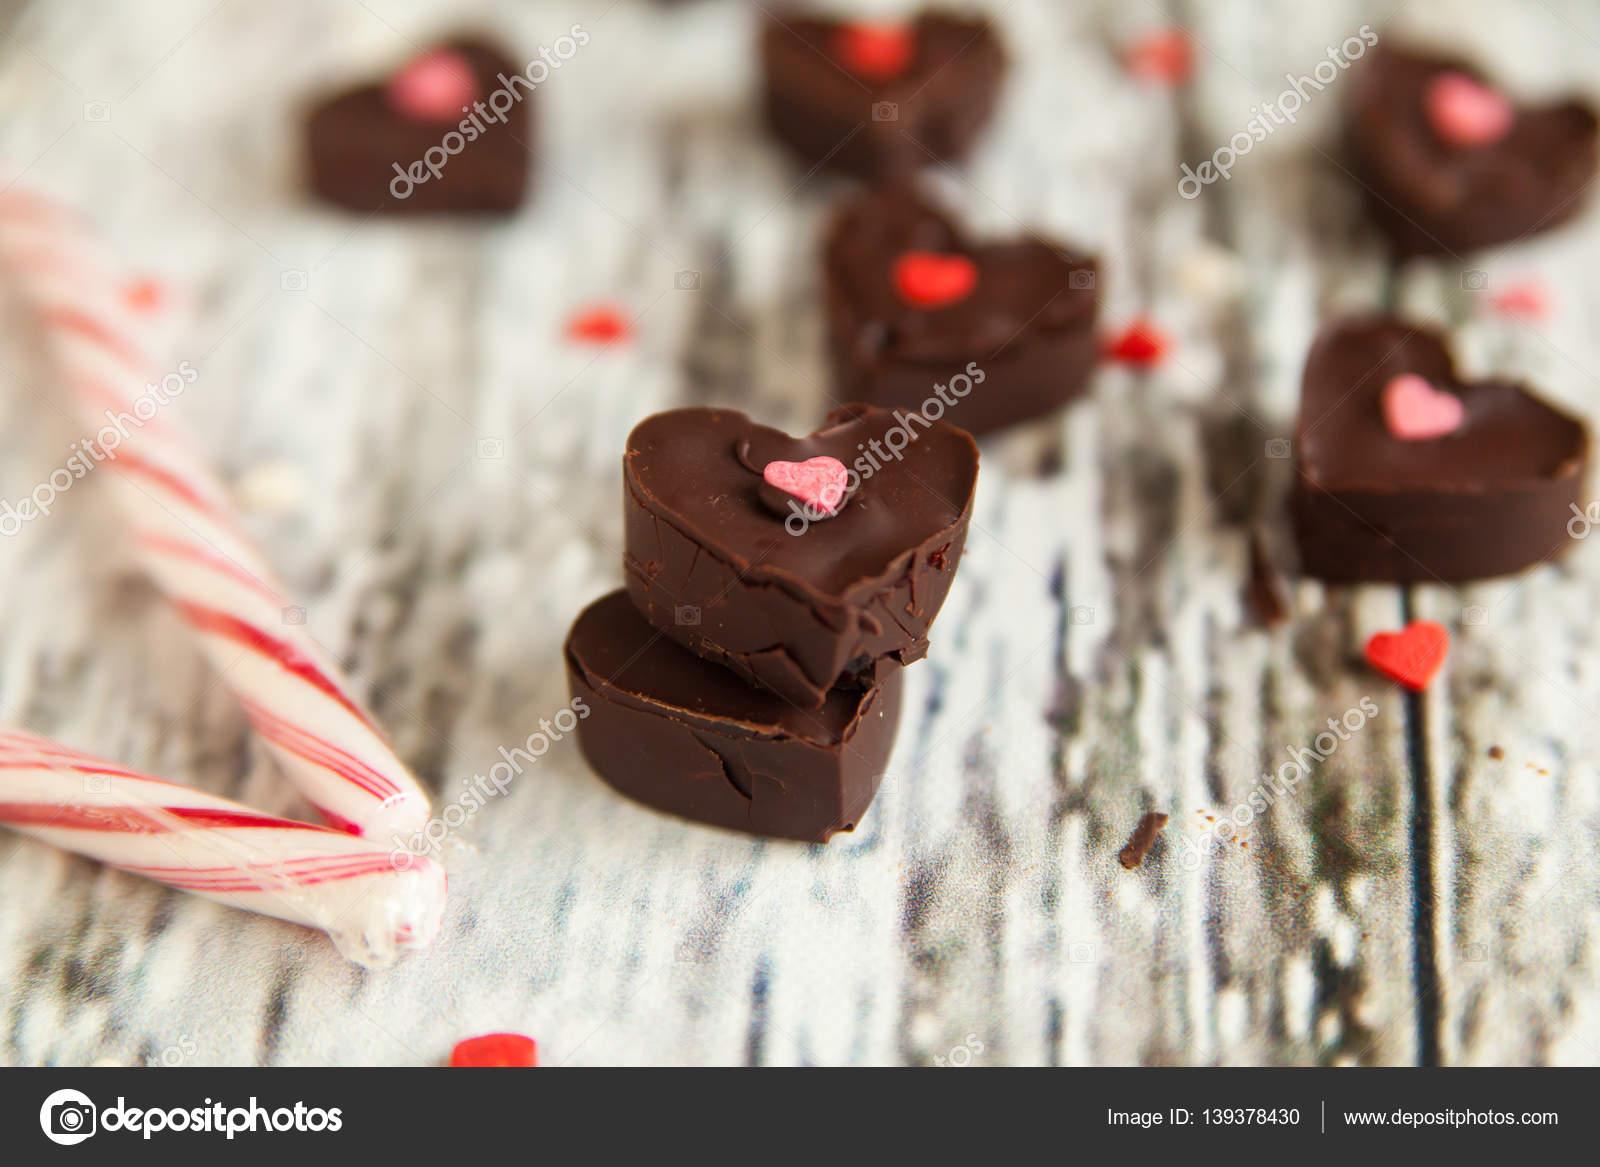 Pralinen Zum Valentinstag St Stockfoto C Gorchichko 139378430